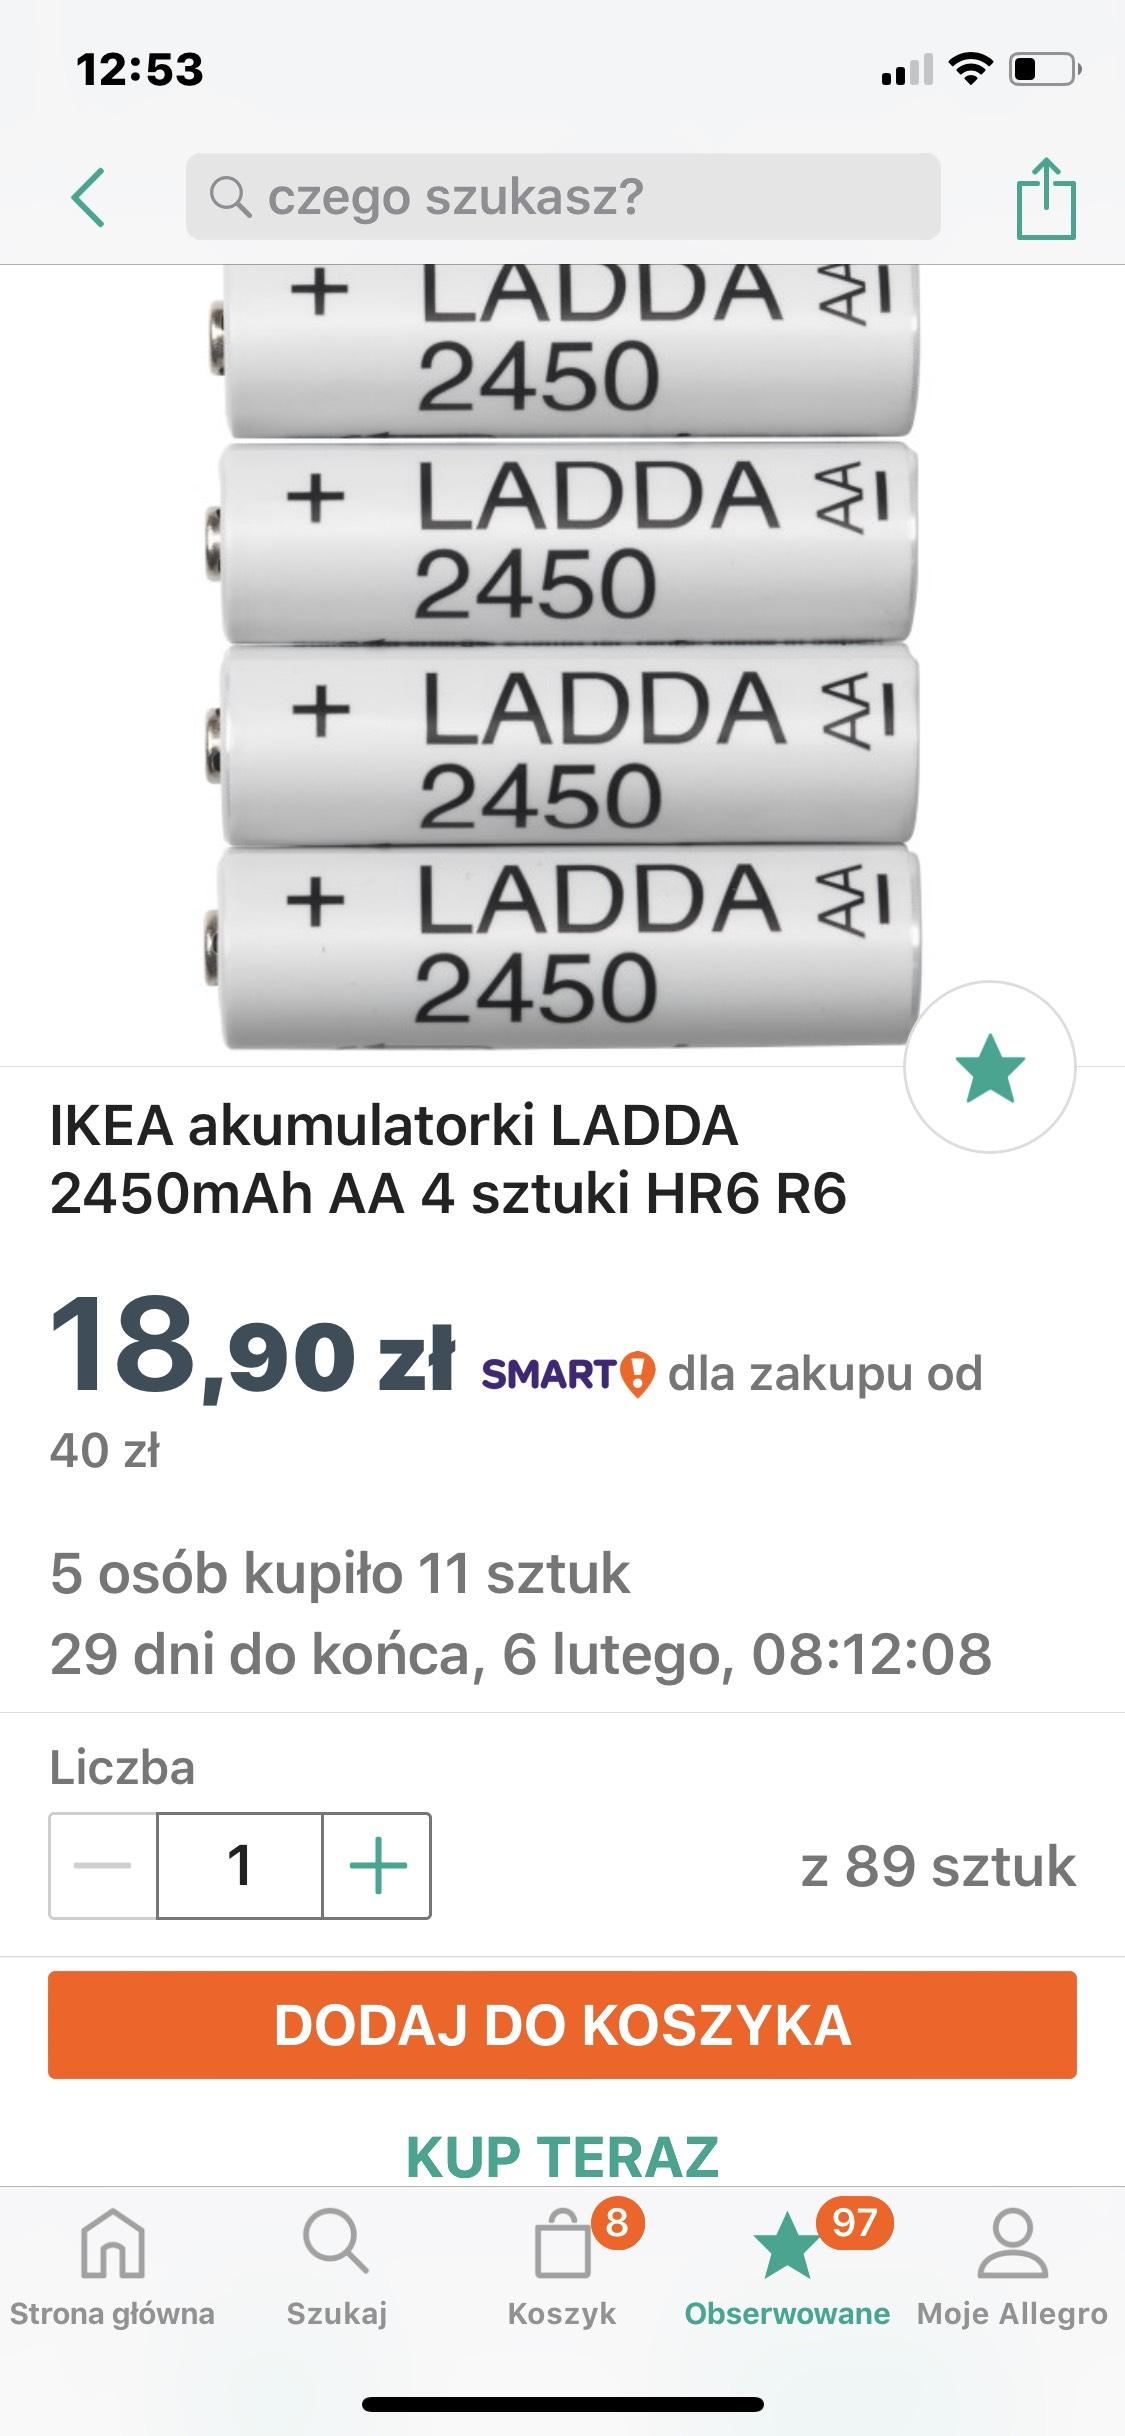 IKEA akumulatorki LADDA 2450mAh AA 4sztuki na Allegro